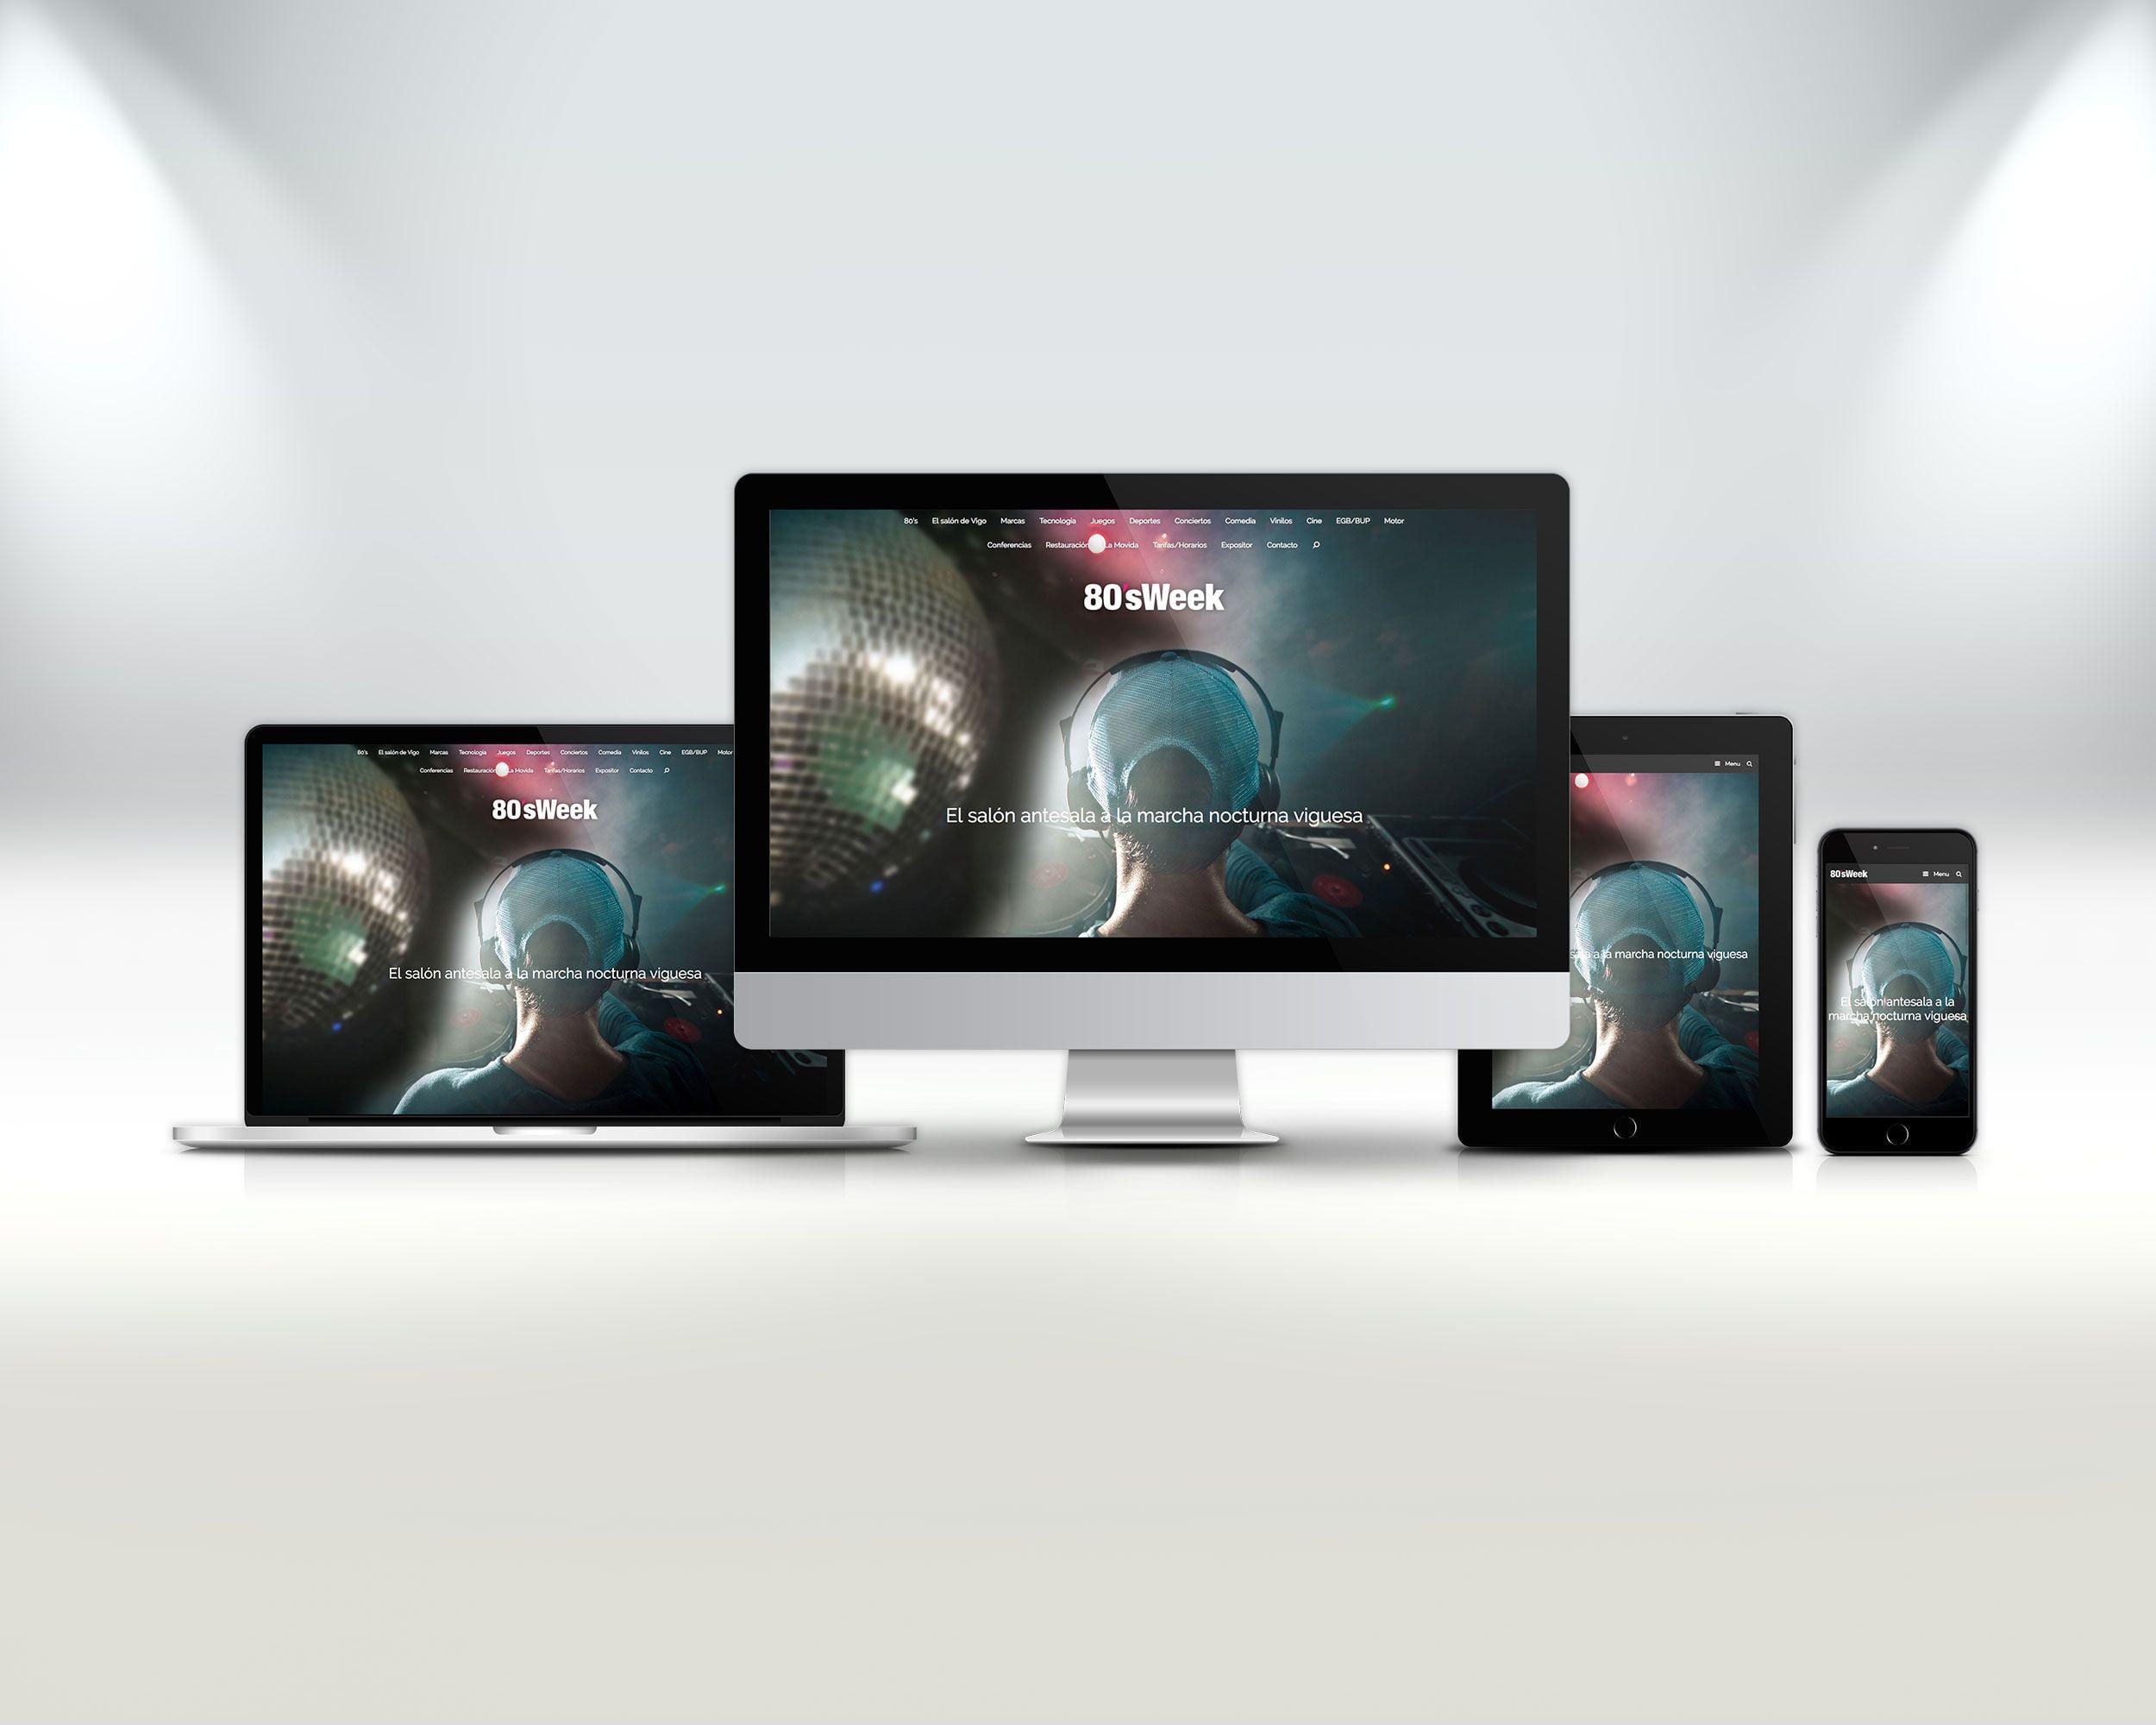 diseño web para dispositivos